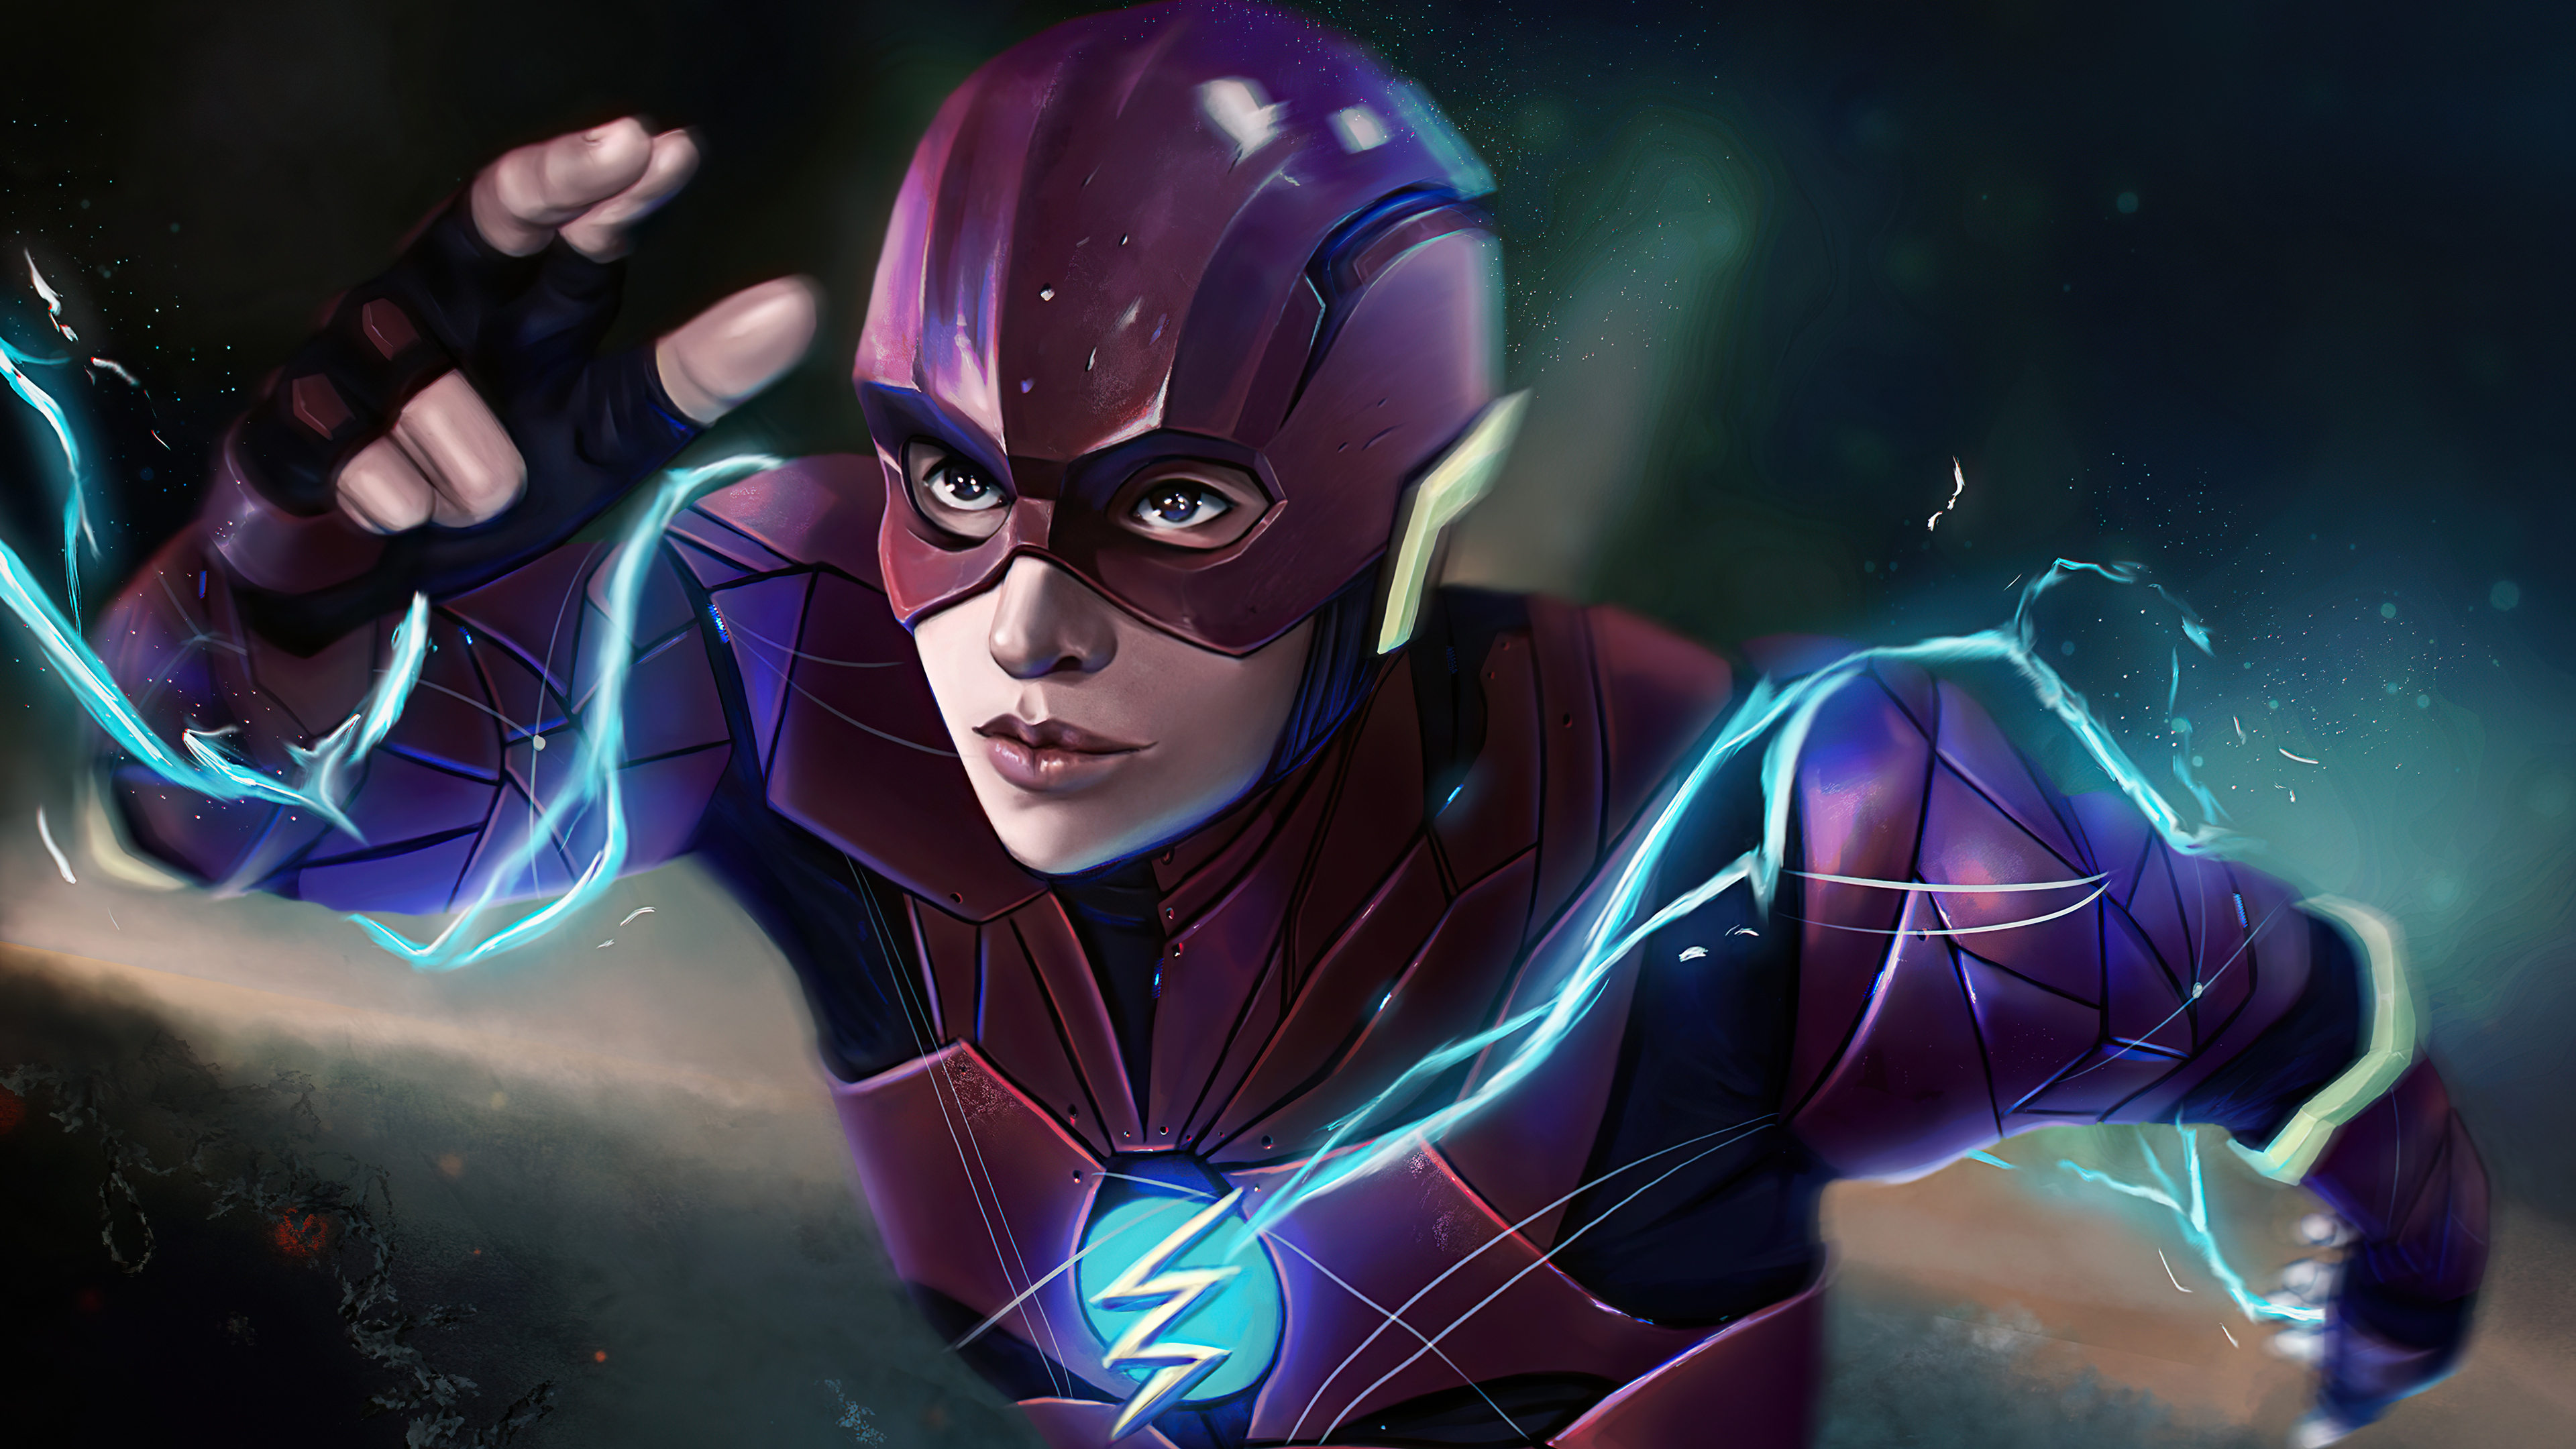 Wallpaper Flash Justice League Snydercut Fanart